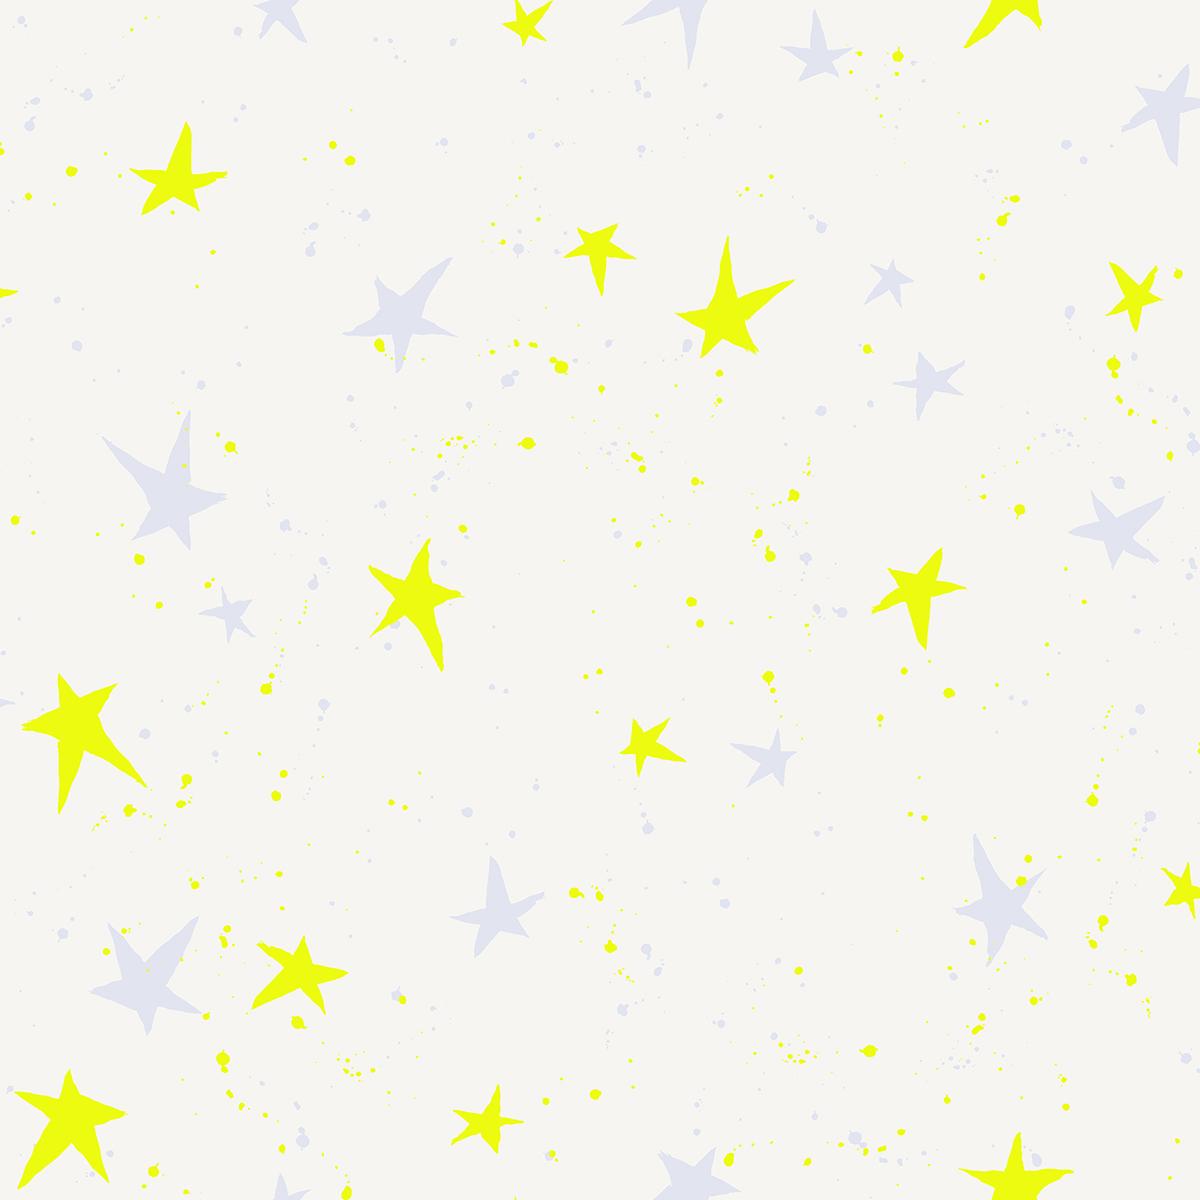 Oka Emi Snow Flowers - Kira Kira Boshi (White Neon)